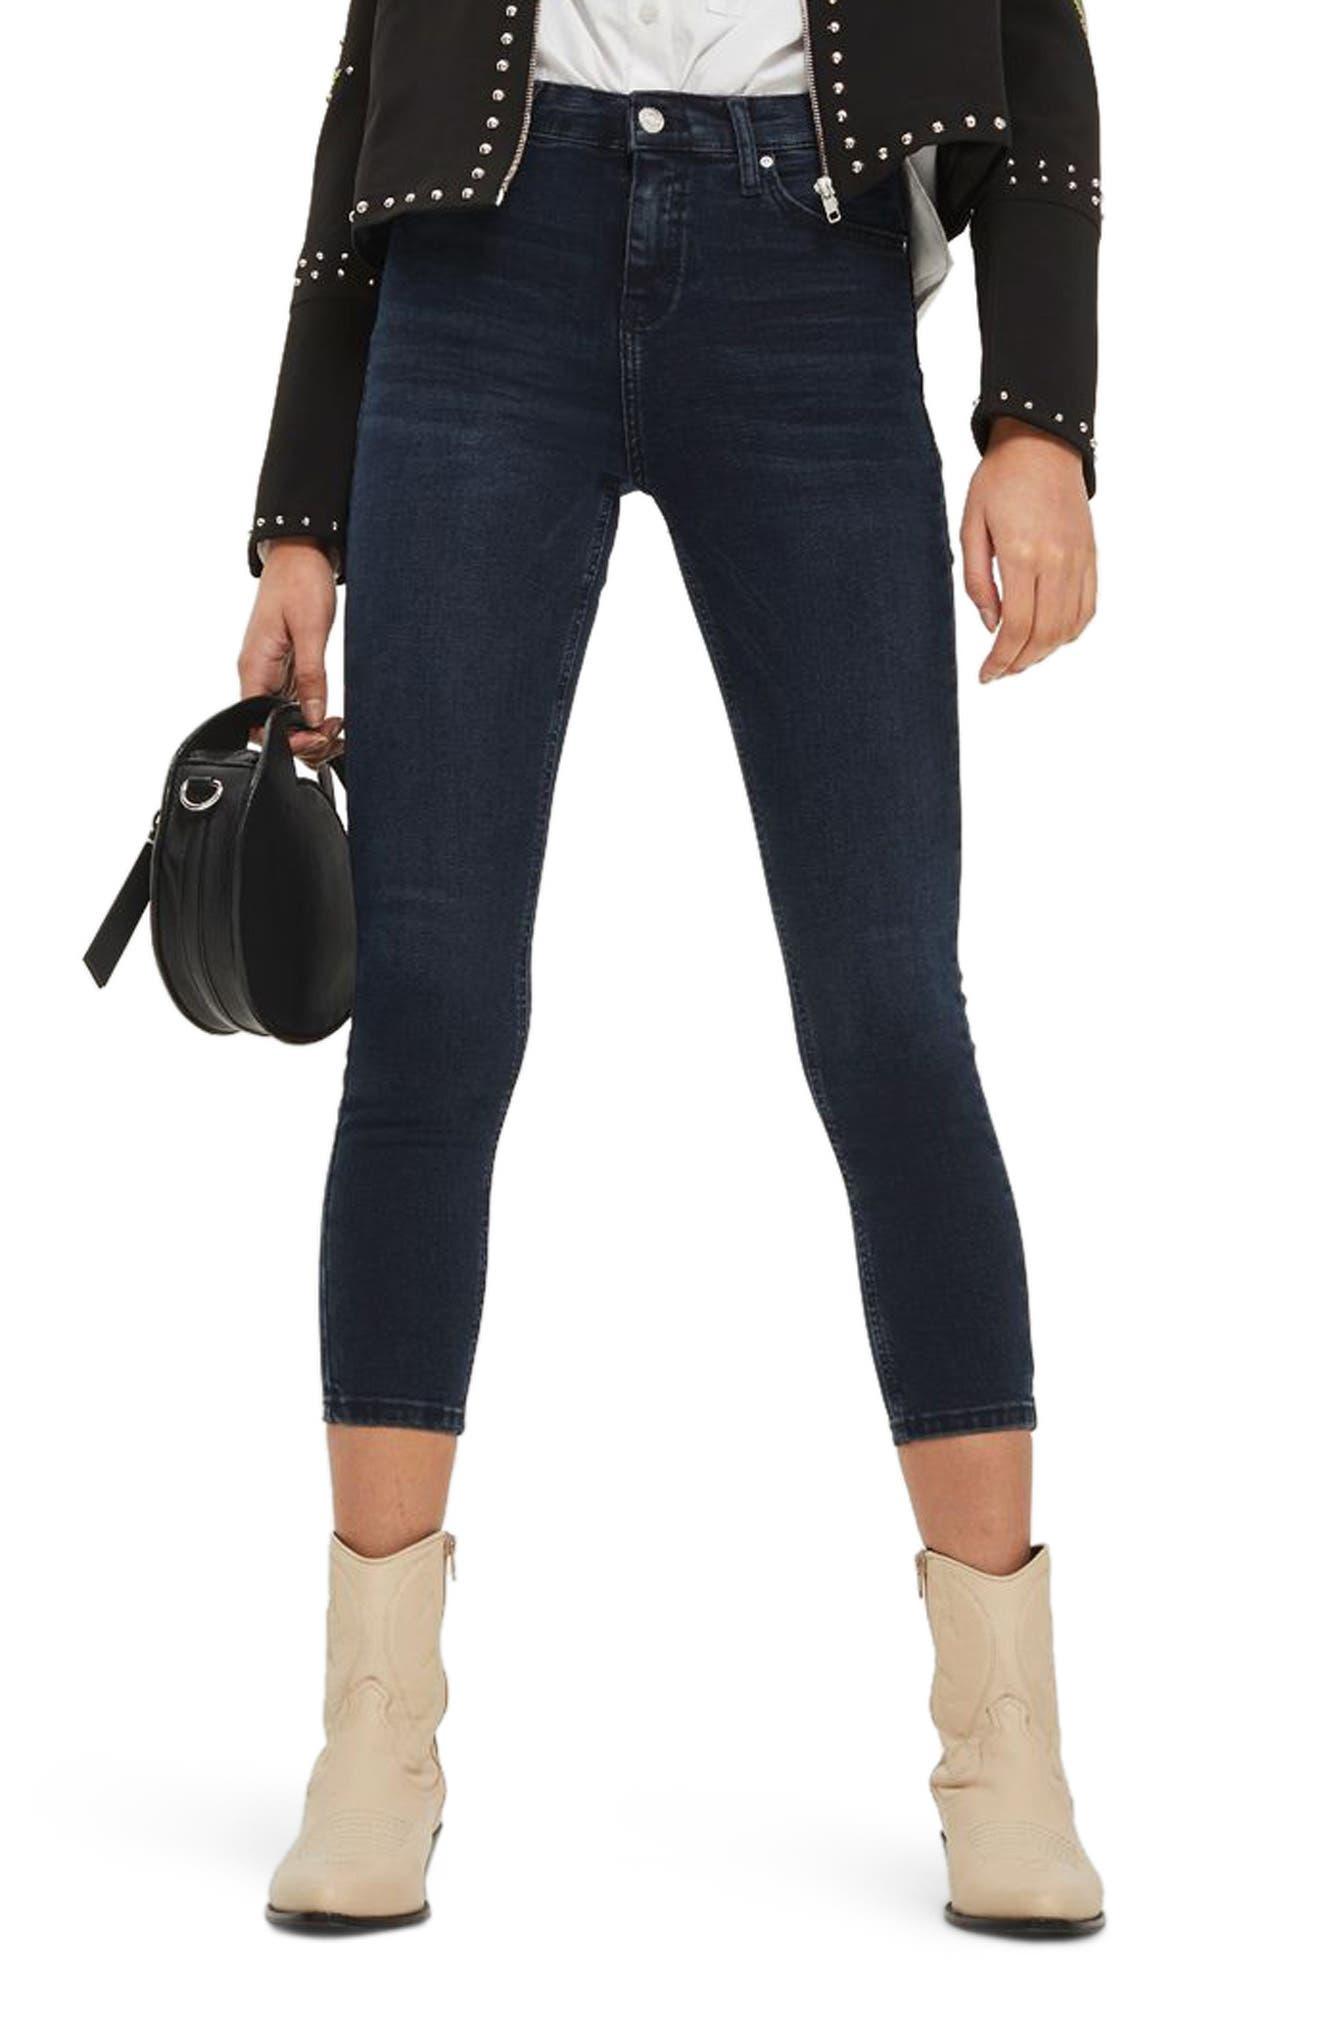 Topshop Joni Crop Skinny Jeans